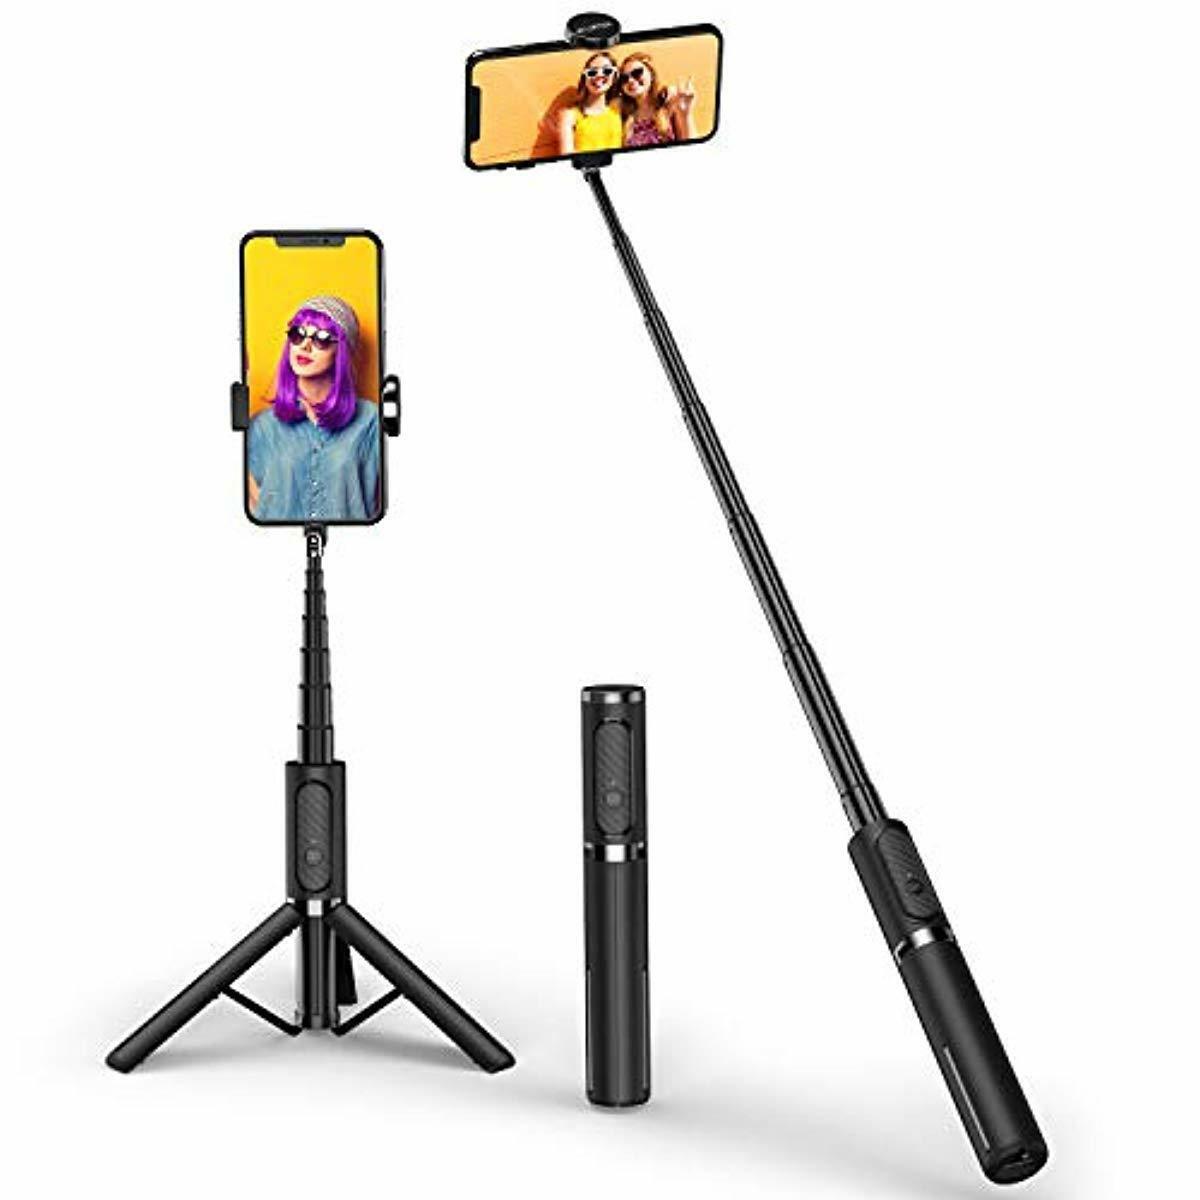 ATUMTEK Bluetooth Selfie Stick Tripod, Mini Extendable 3 in